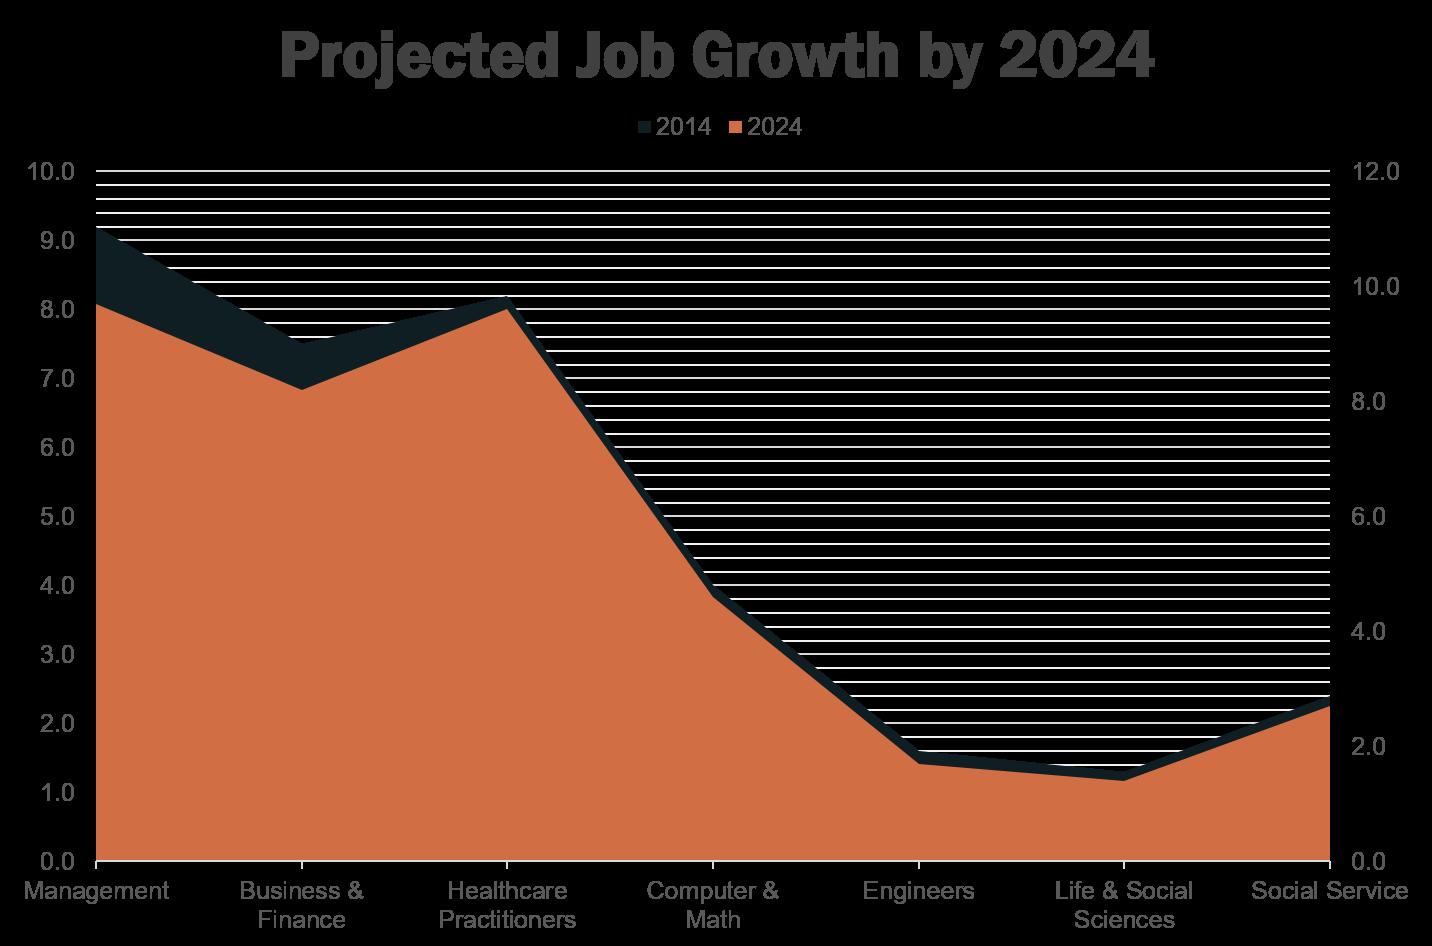 BLS_Projected_Job_Growth_2024.png